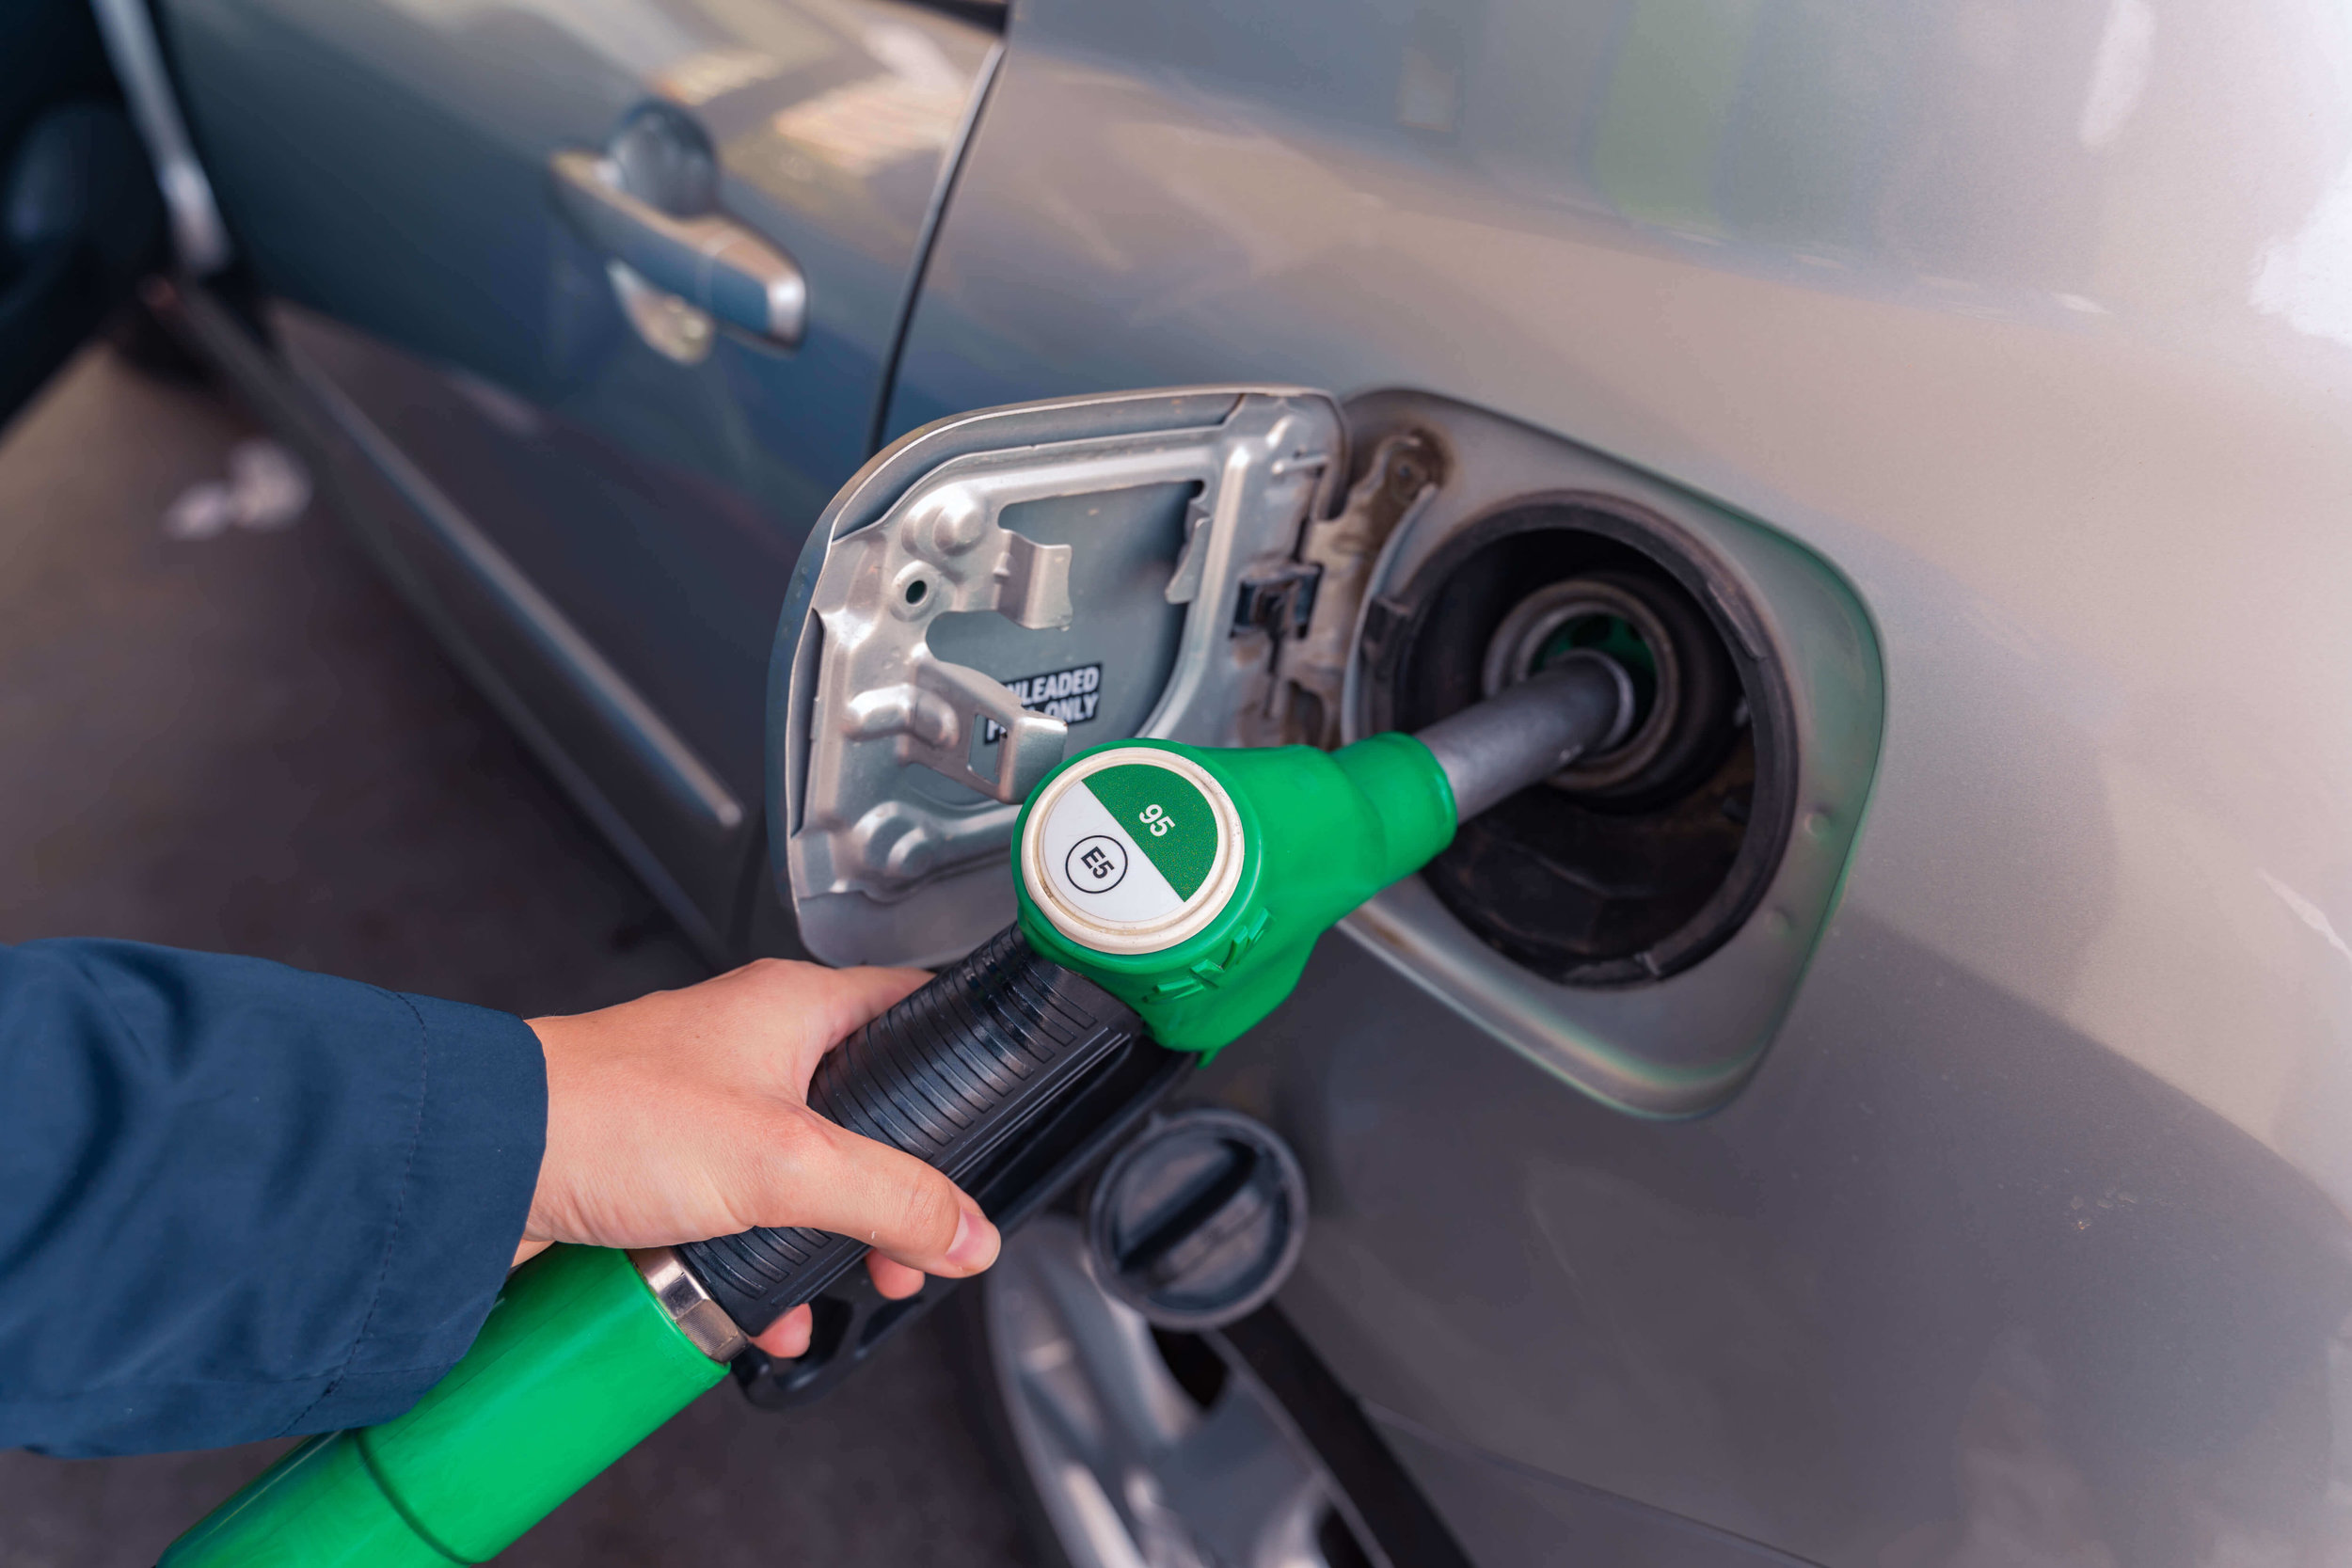 E10 petrol pump